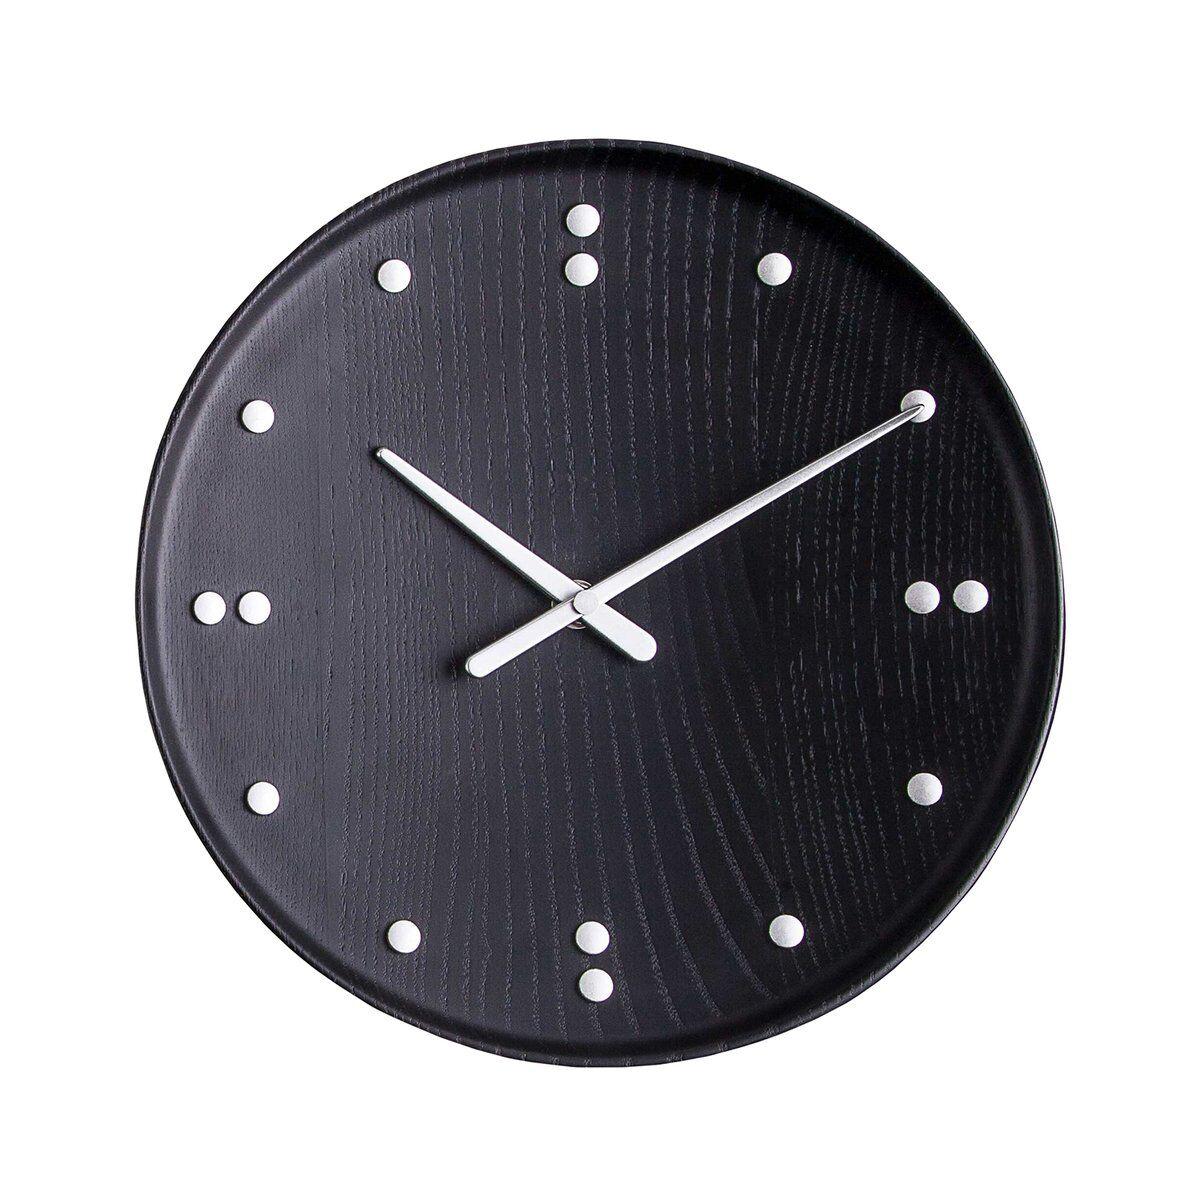 Architectmade FJ Clock seinäkello 25 cm, musta